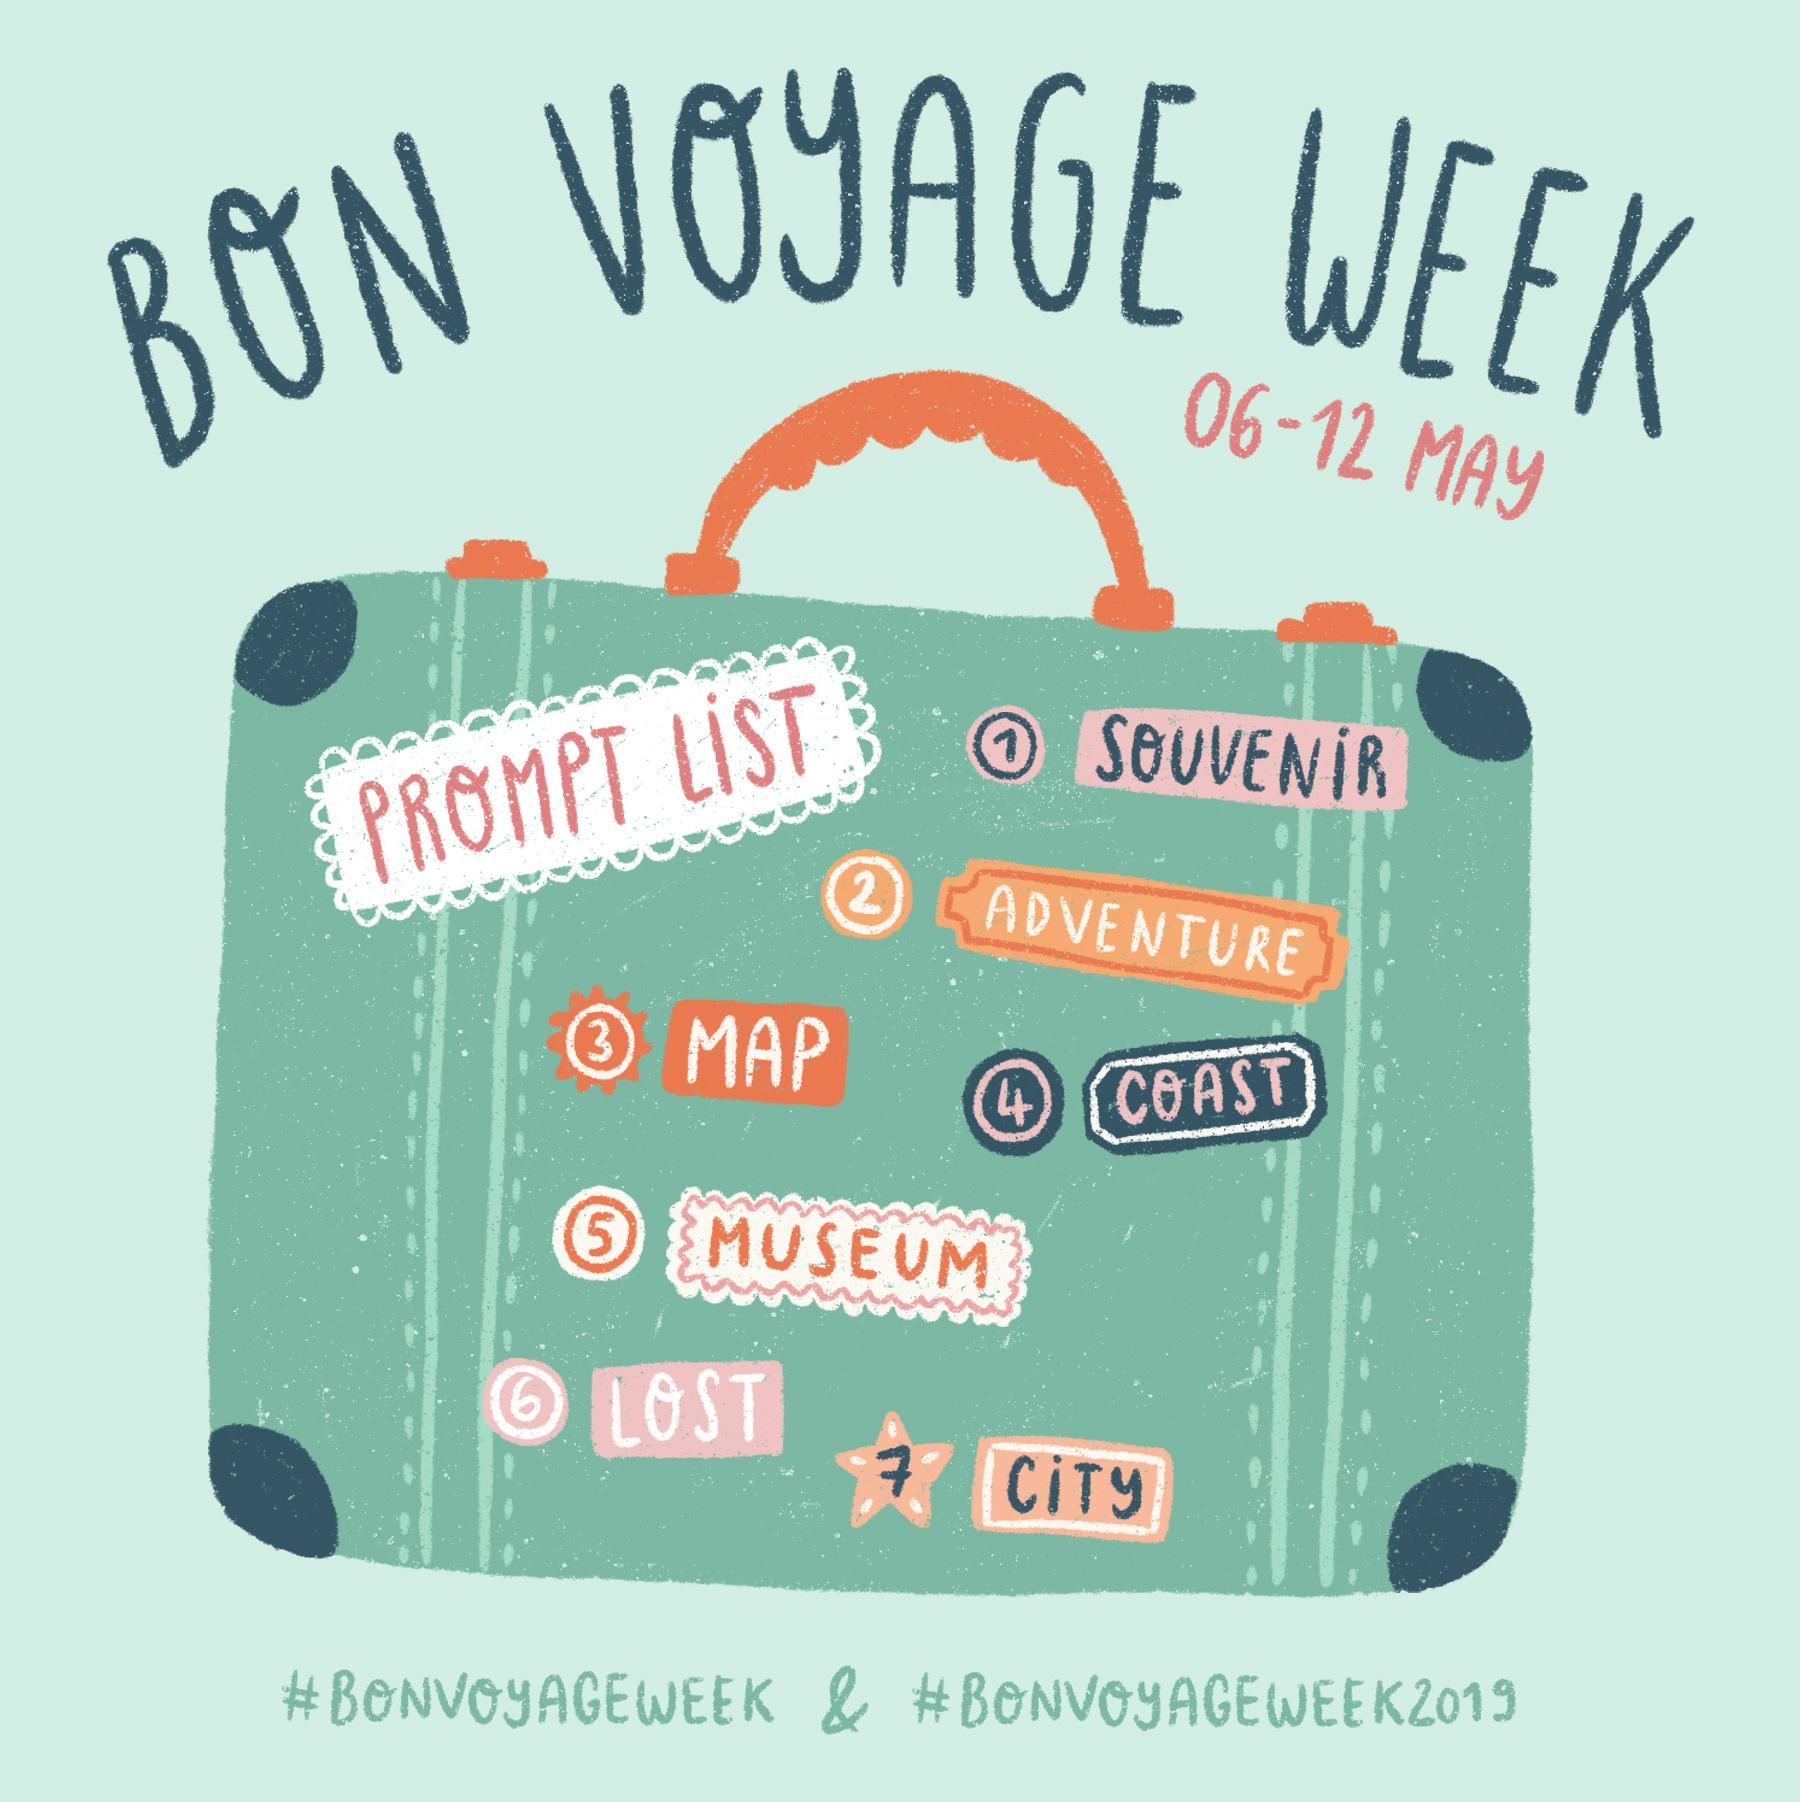 Carole_Chevalier-Bon_Voyage_Week-2.jpg